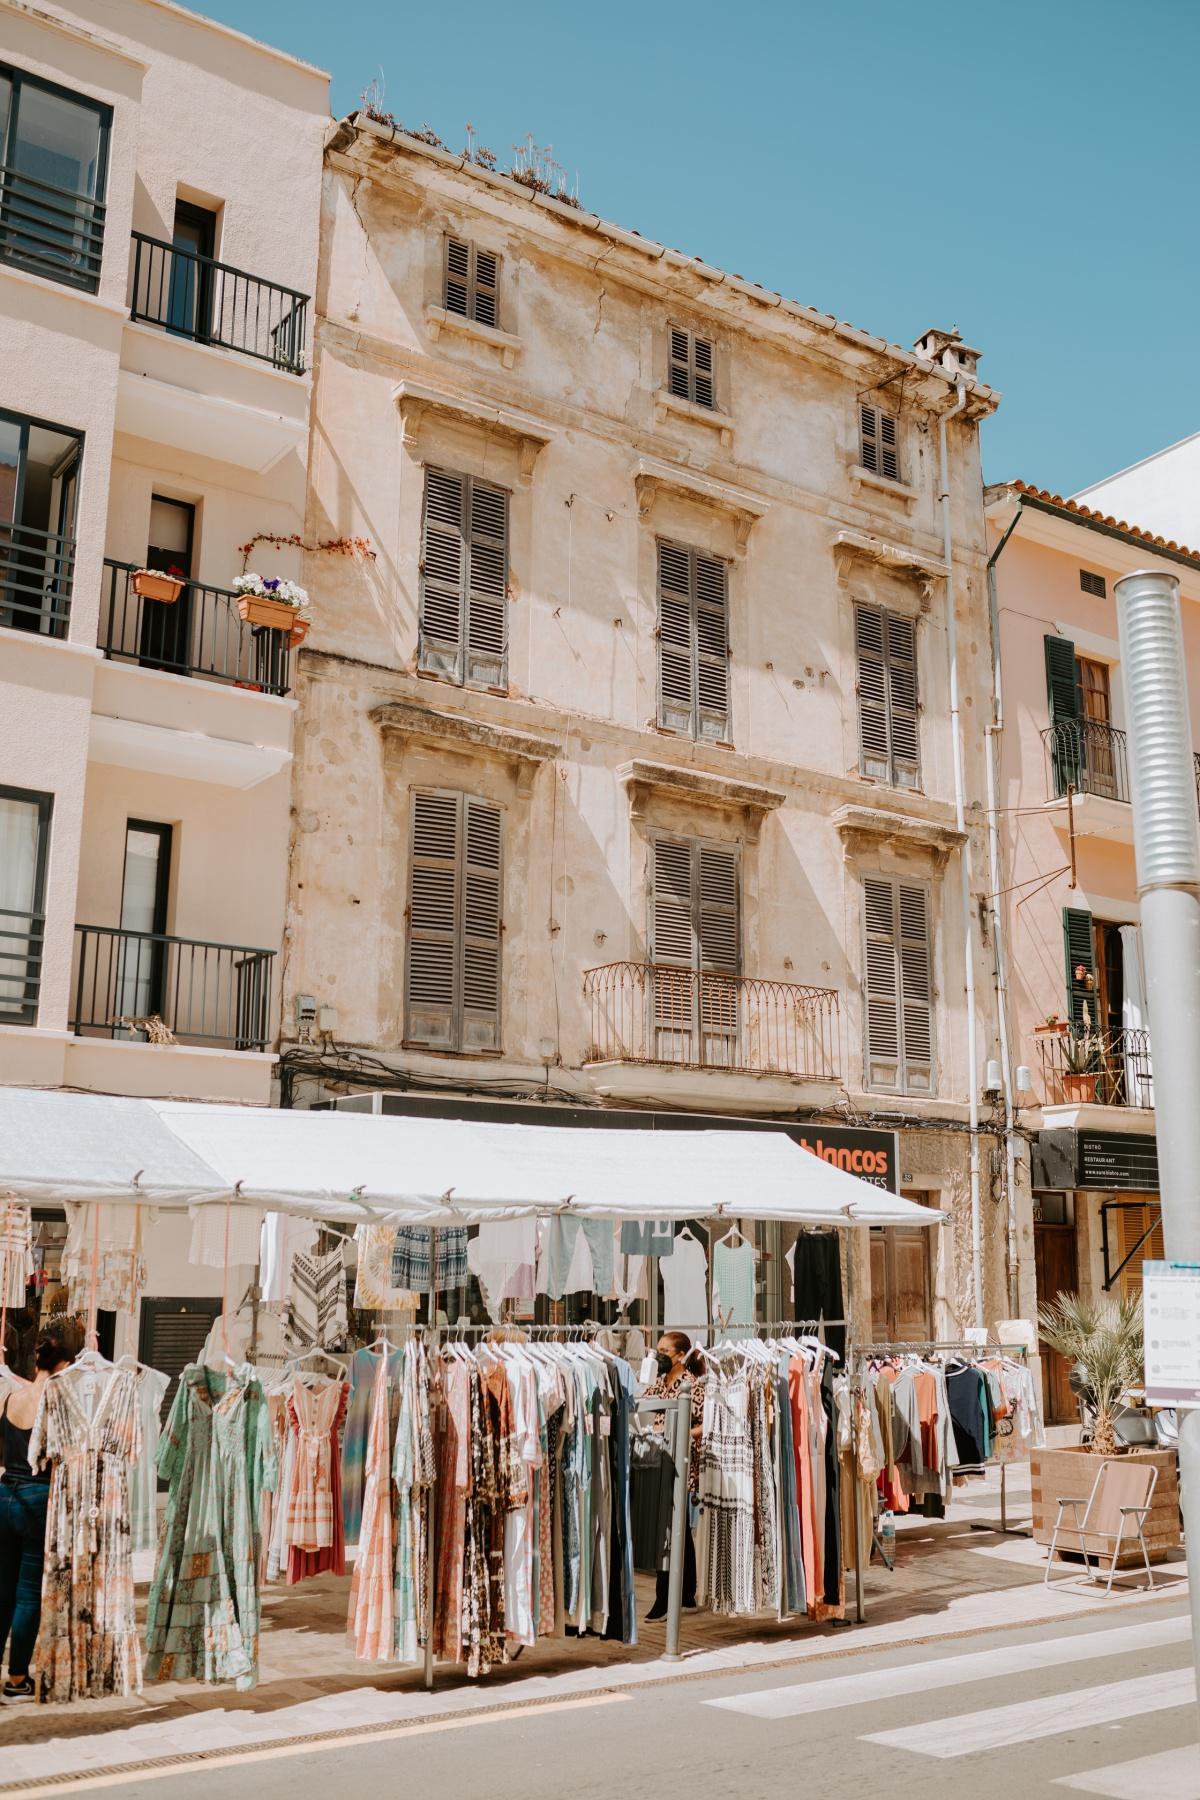 Old buildings in the Inca Market Mallorca Spain